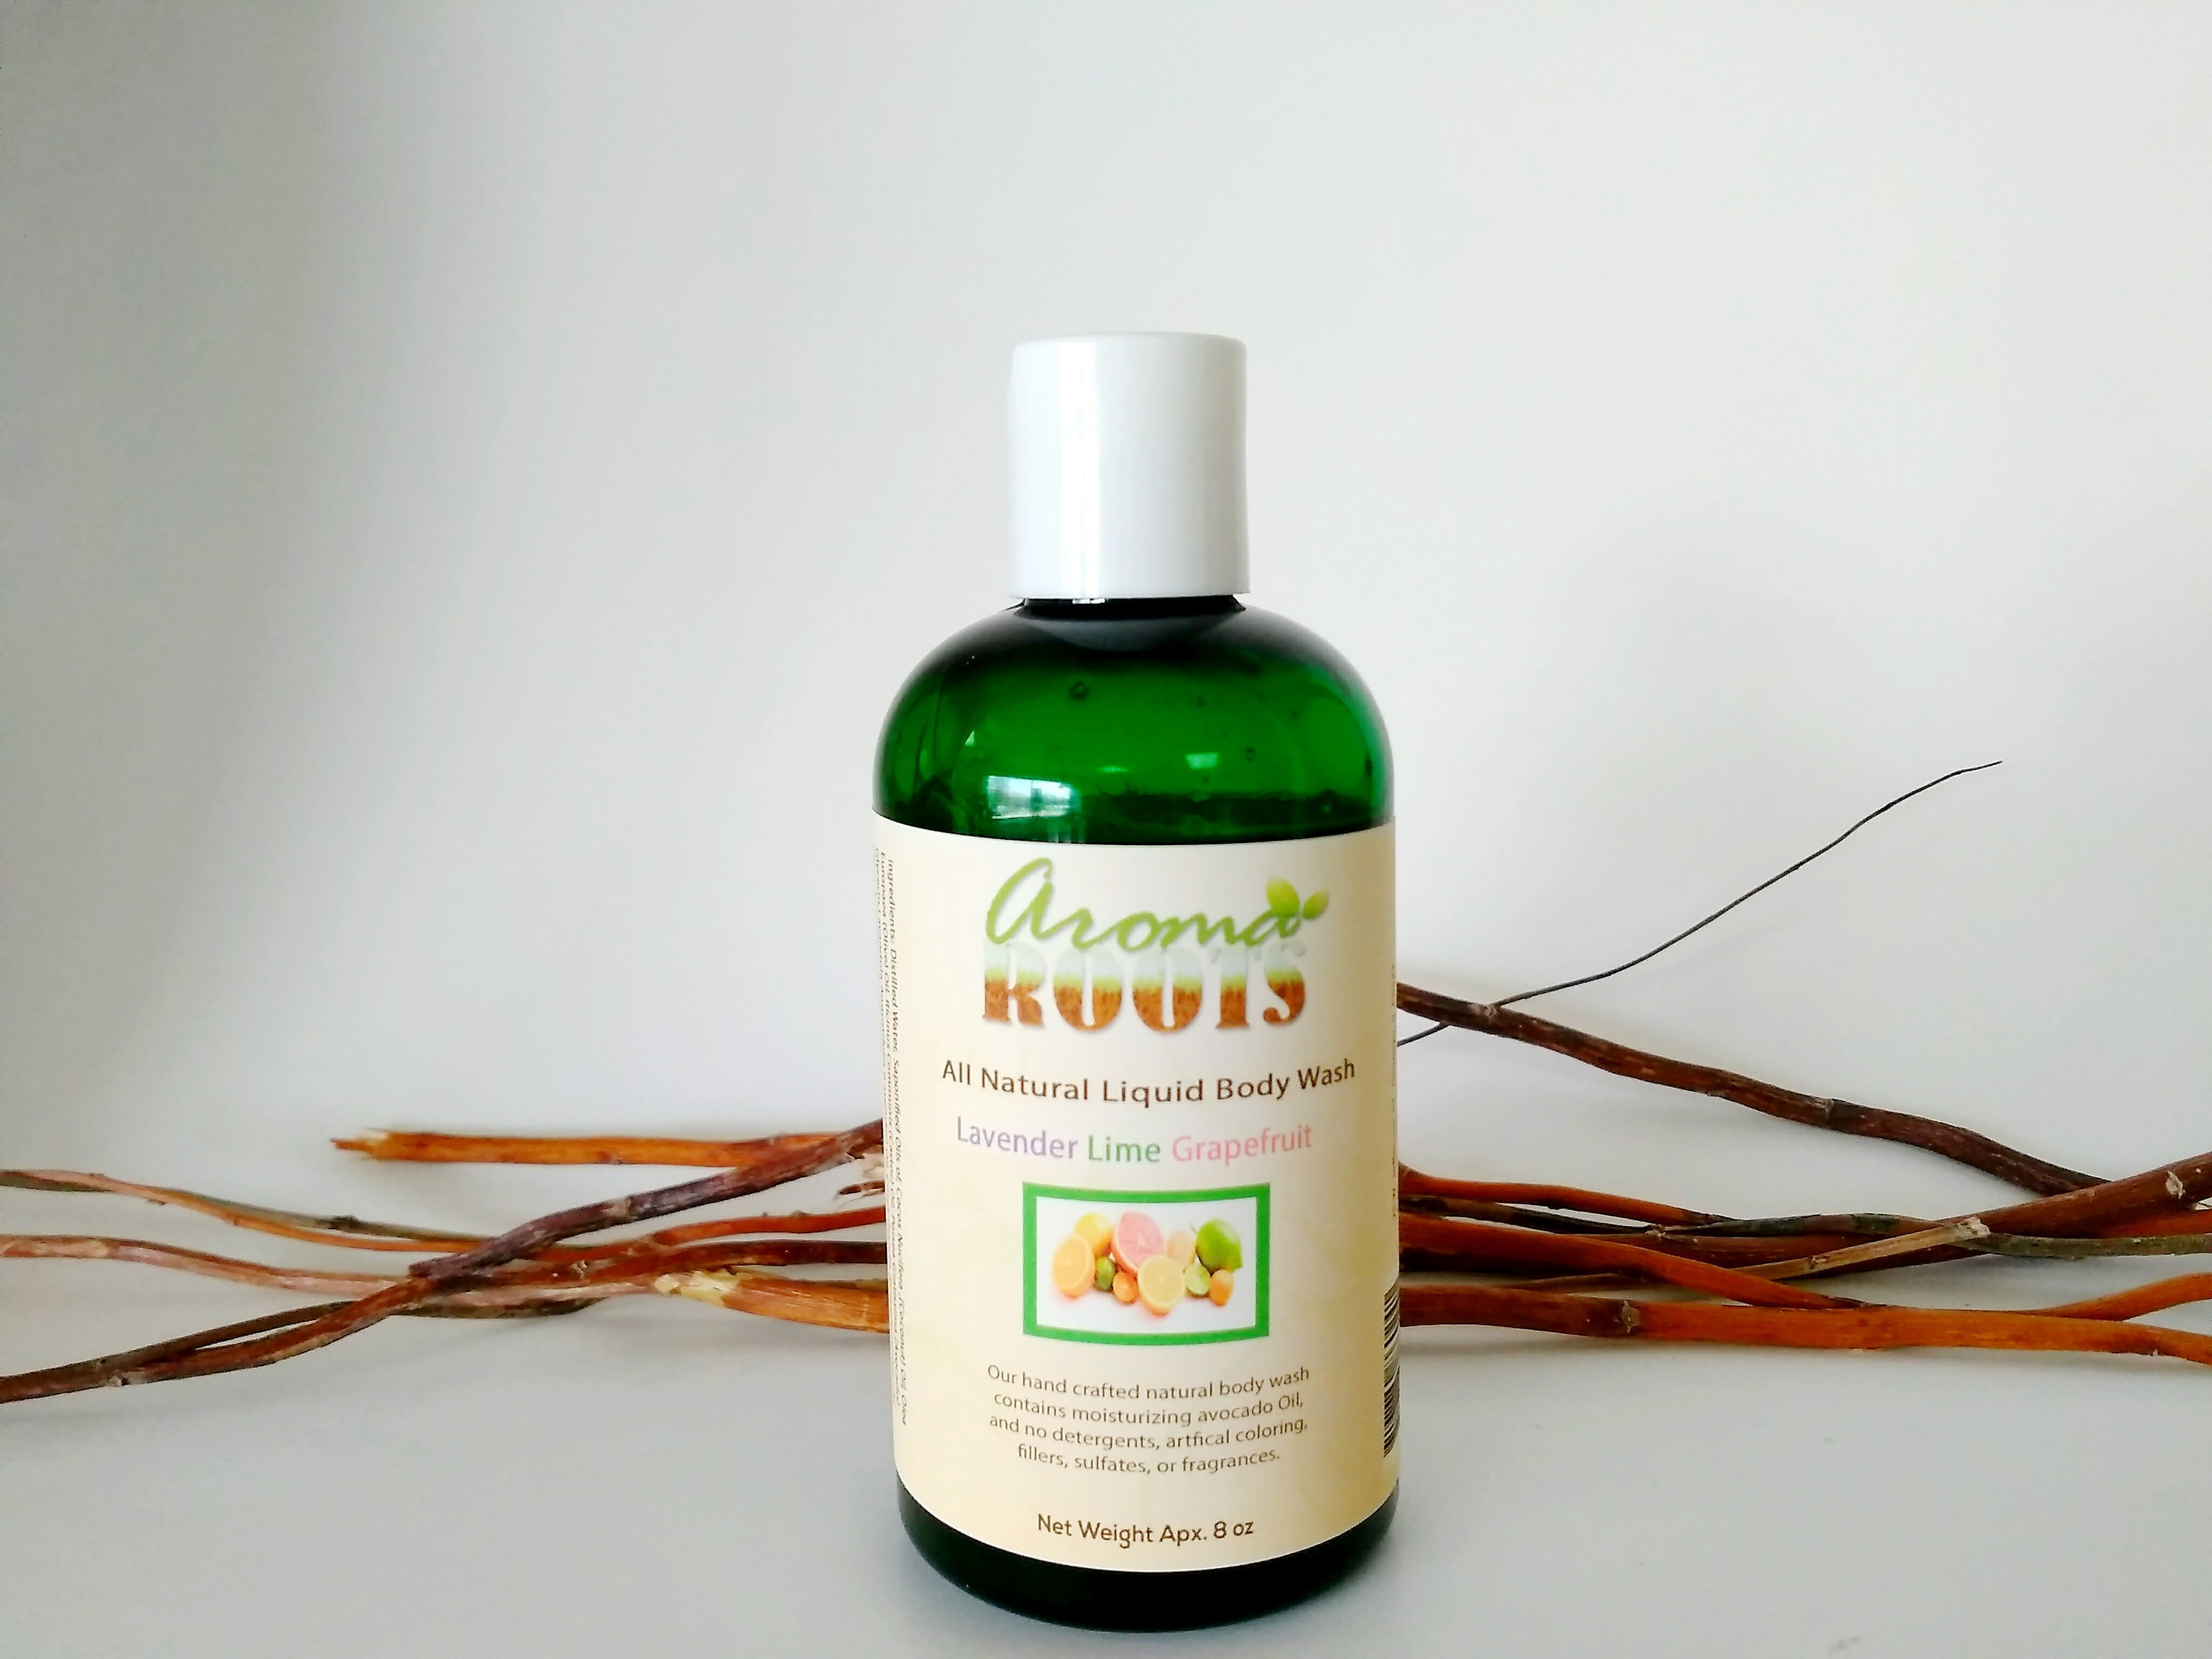 Lavender, Lime, Grapefruit Body Wash 717880860241